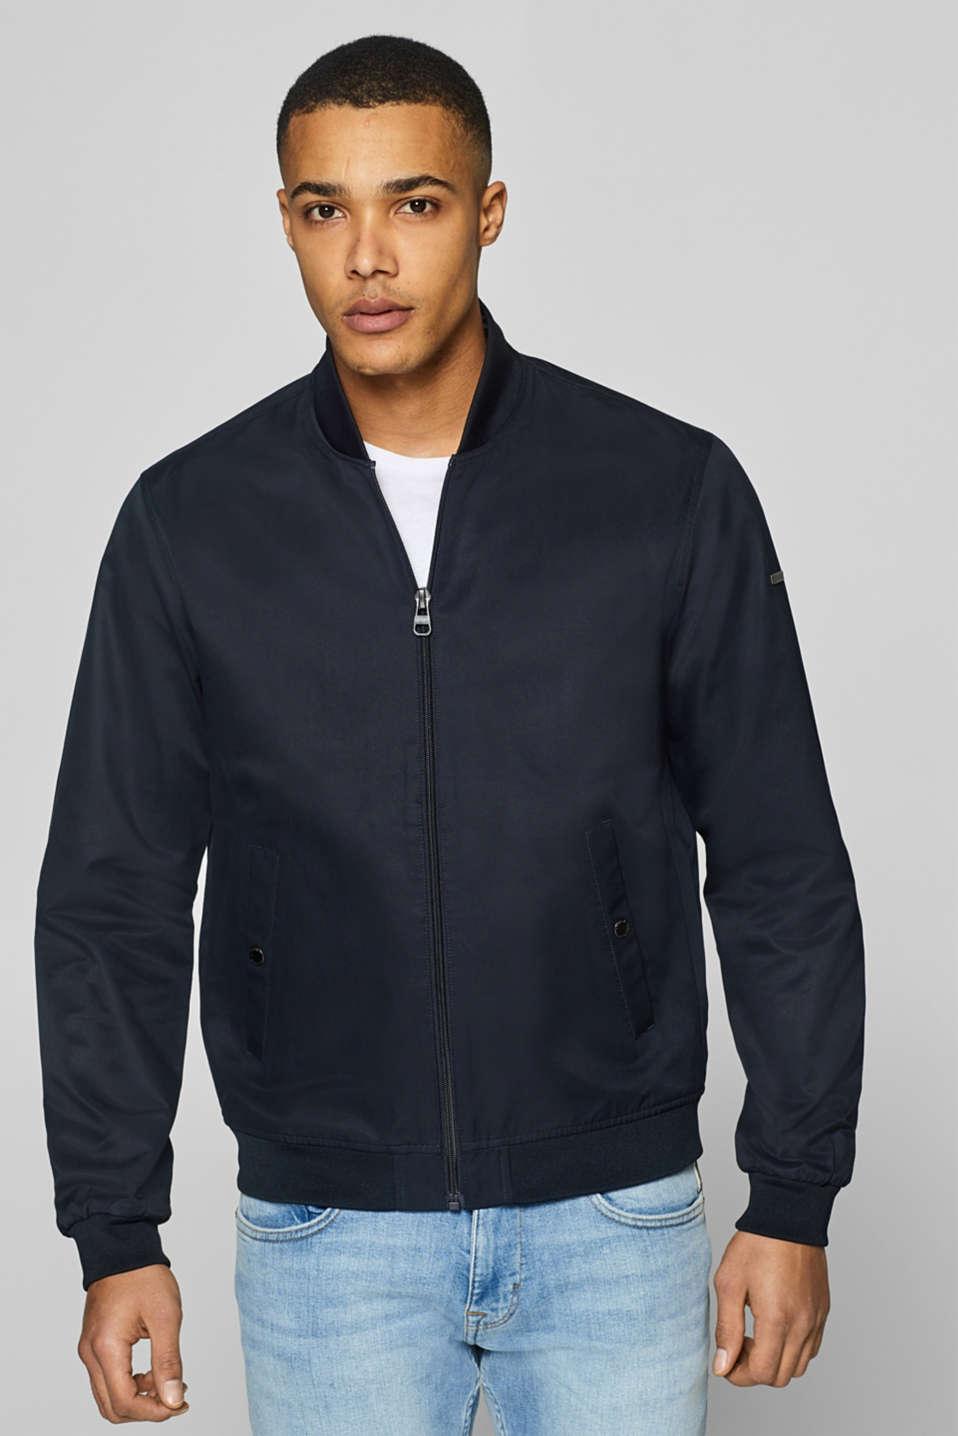 Esprit - Twill bomber jacket